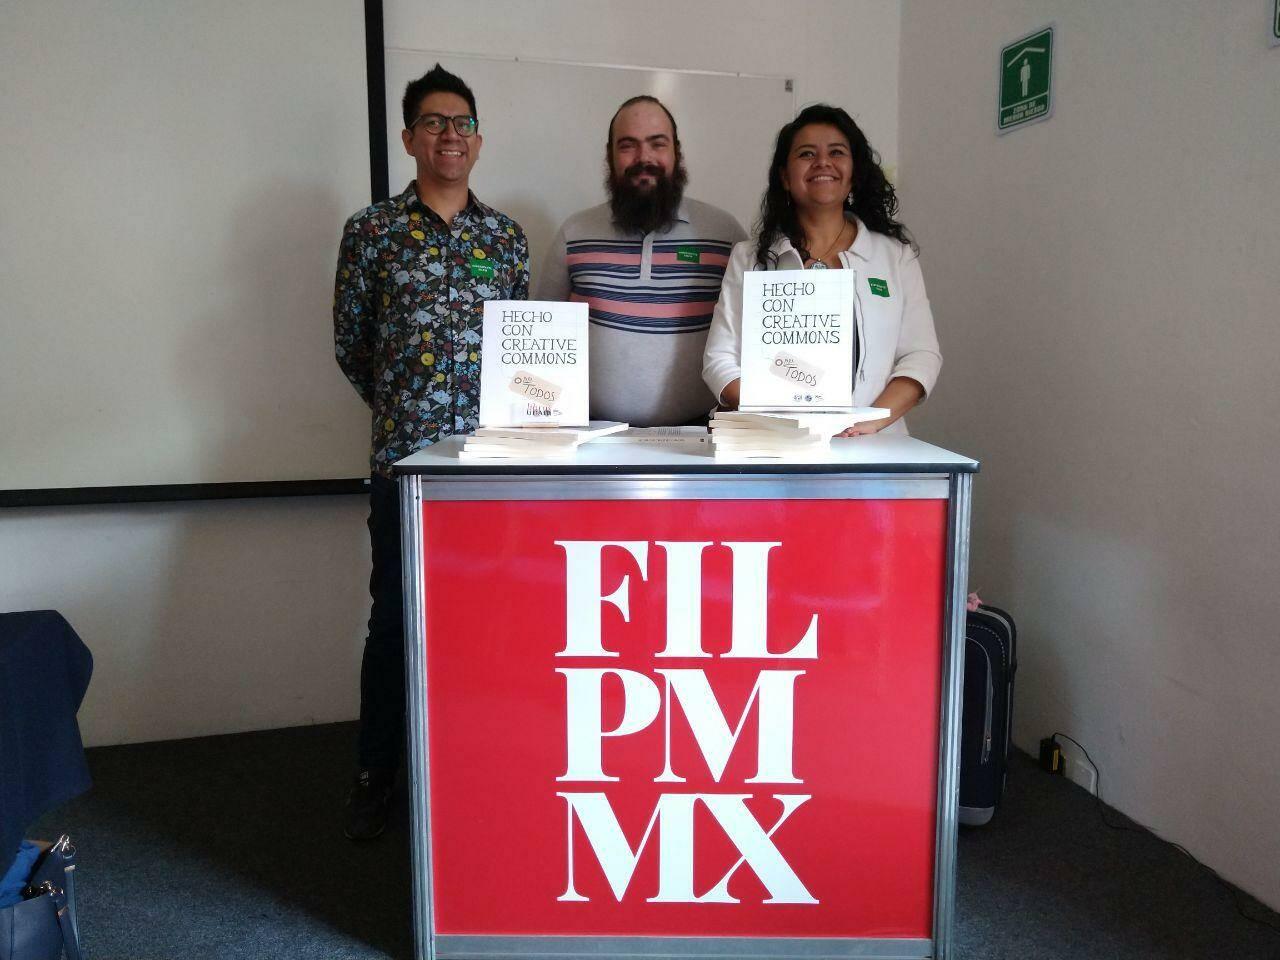 Iván Martínez, Gunnar Wolf and Irene Soria, del Capítulo Creative Commons Mexico